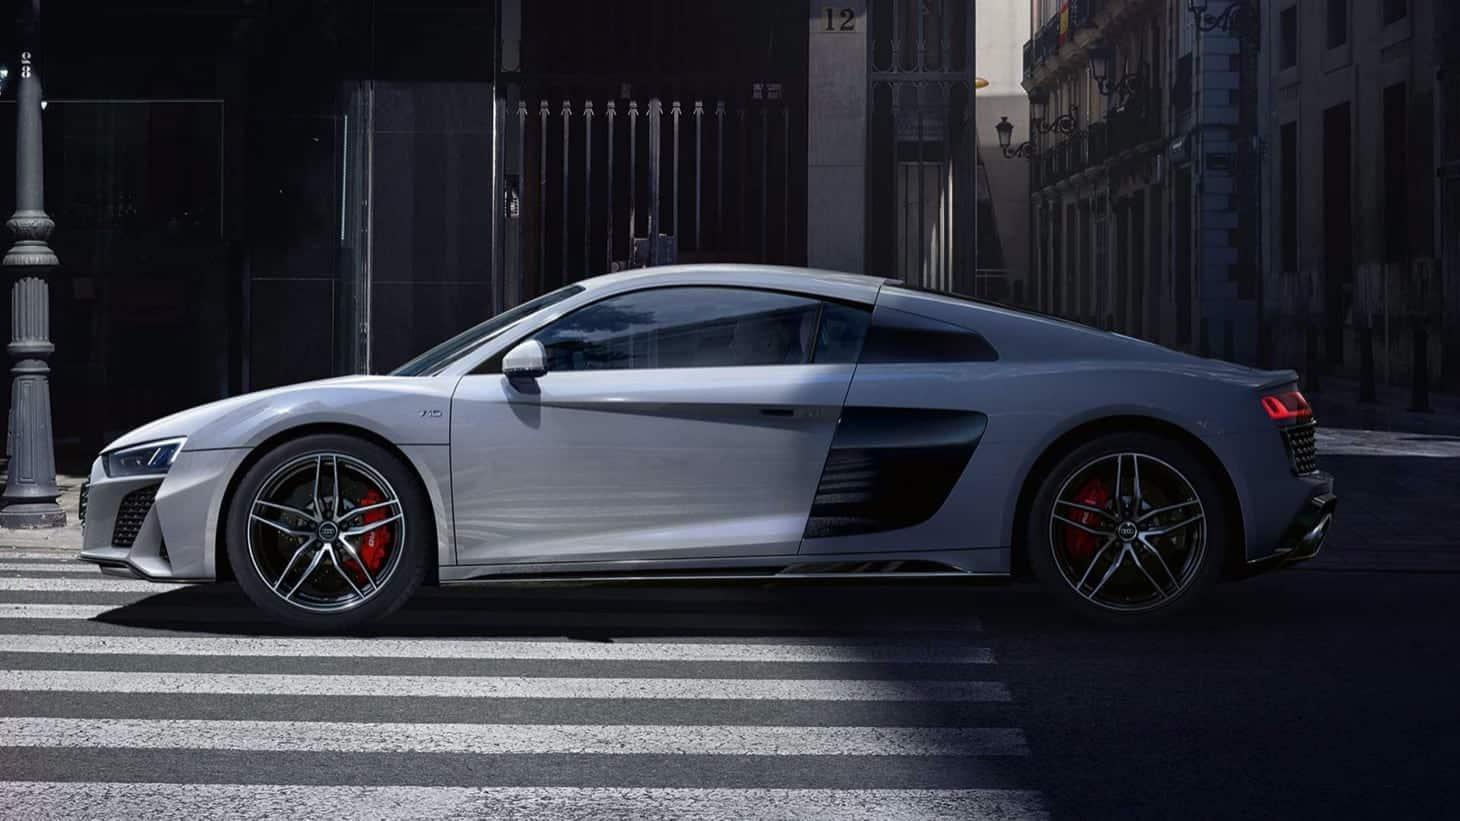 Kelebihan Kekurangan Audi R8 Coupé Review